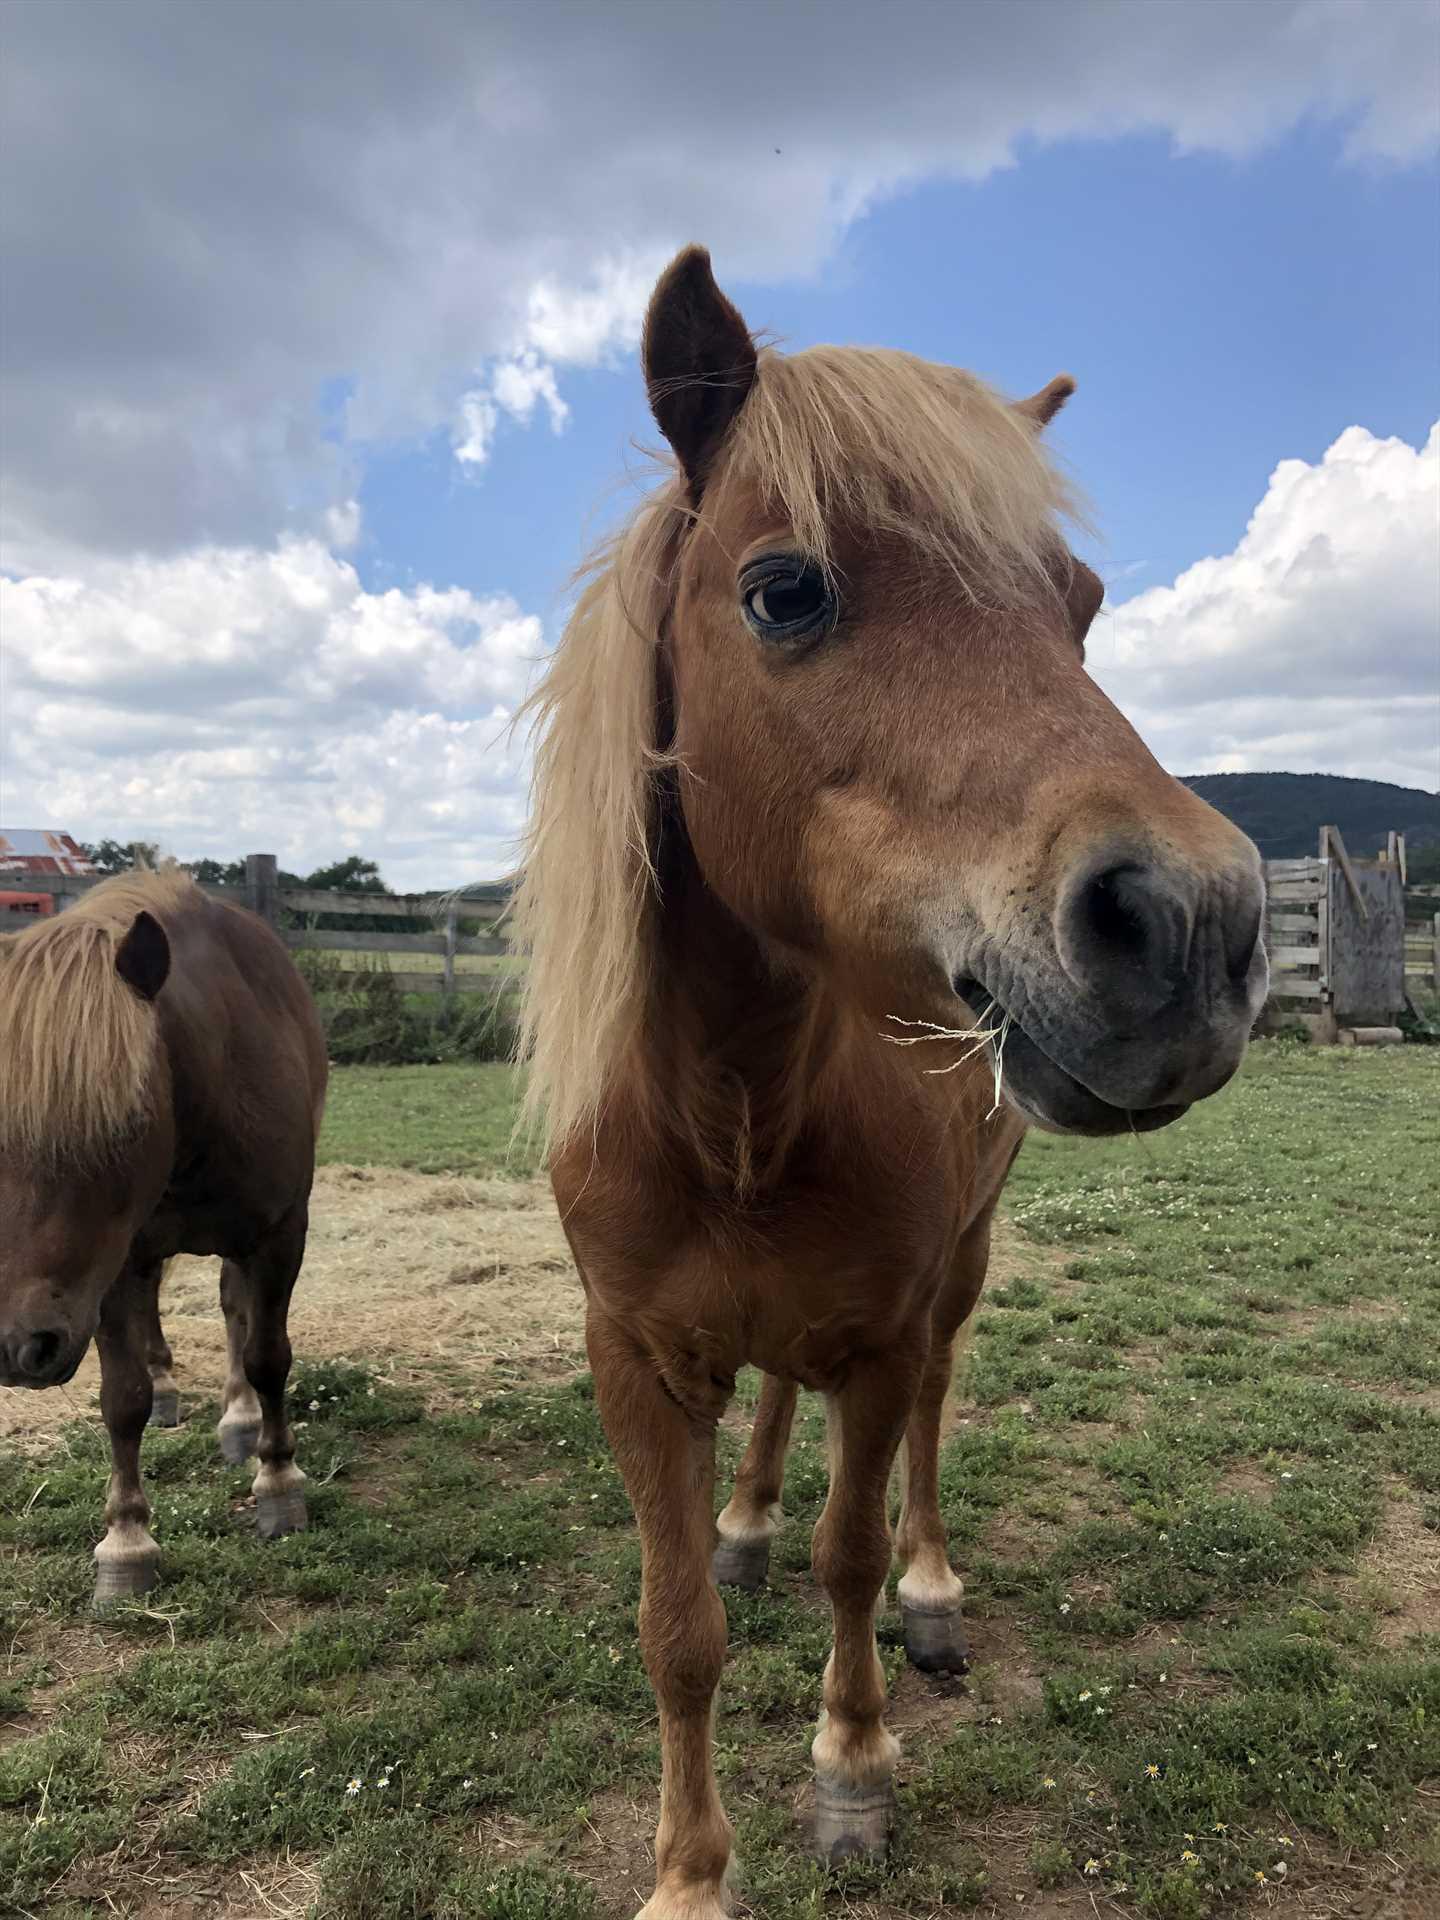 The miniature horses on the farm love greeting visitors!